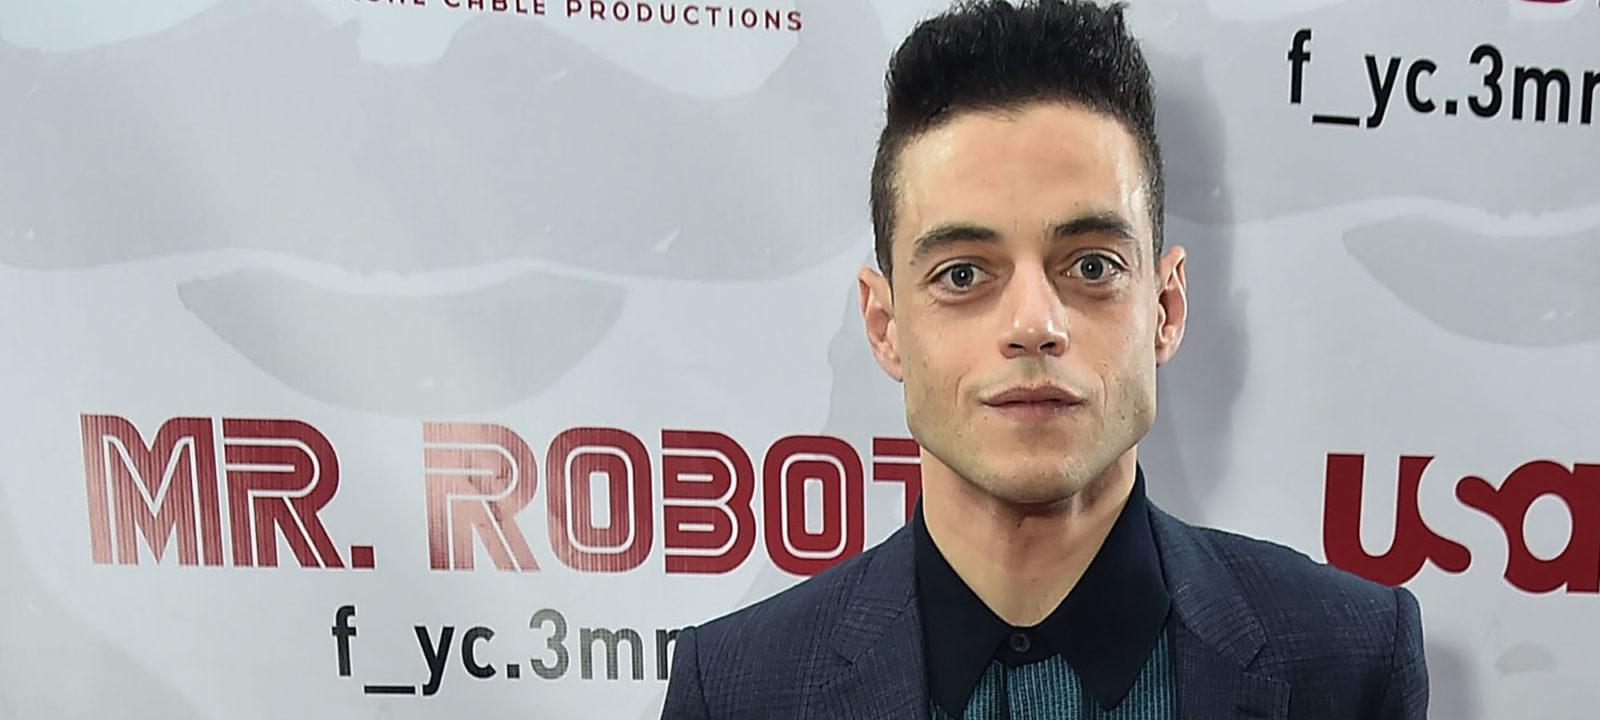 """Mr. Robot"" FYC Screening"